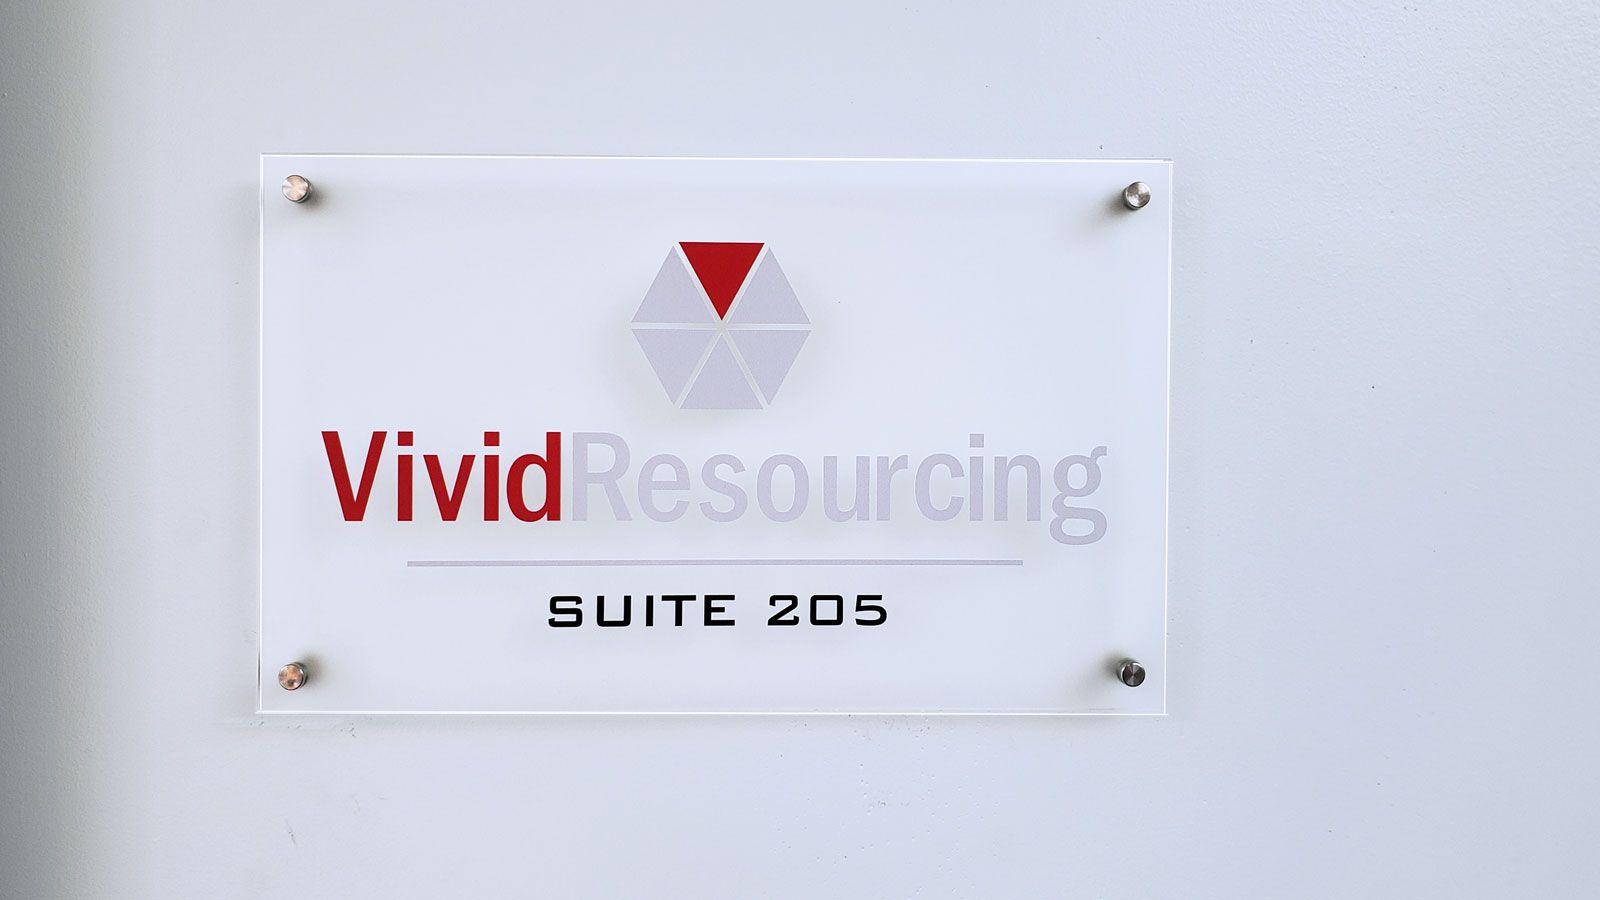 Vivid Resourcing acrylic sign